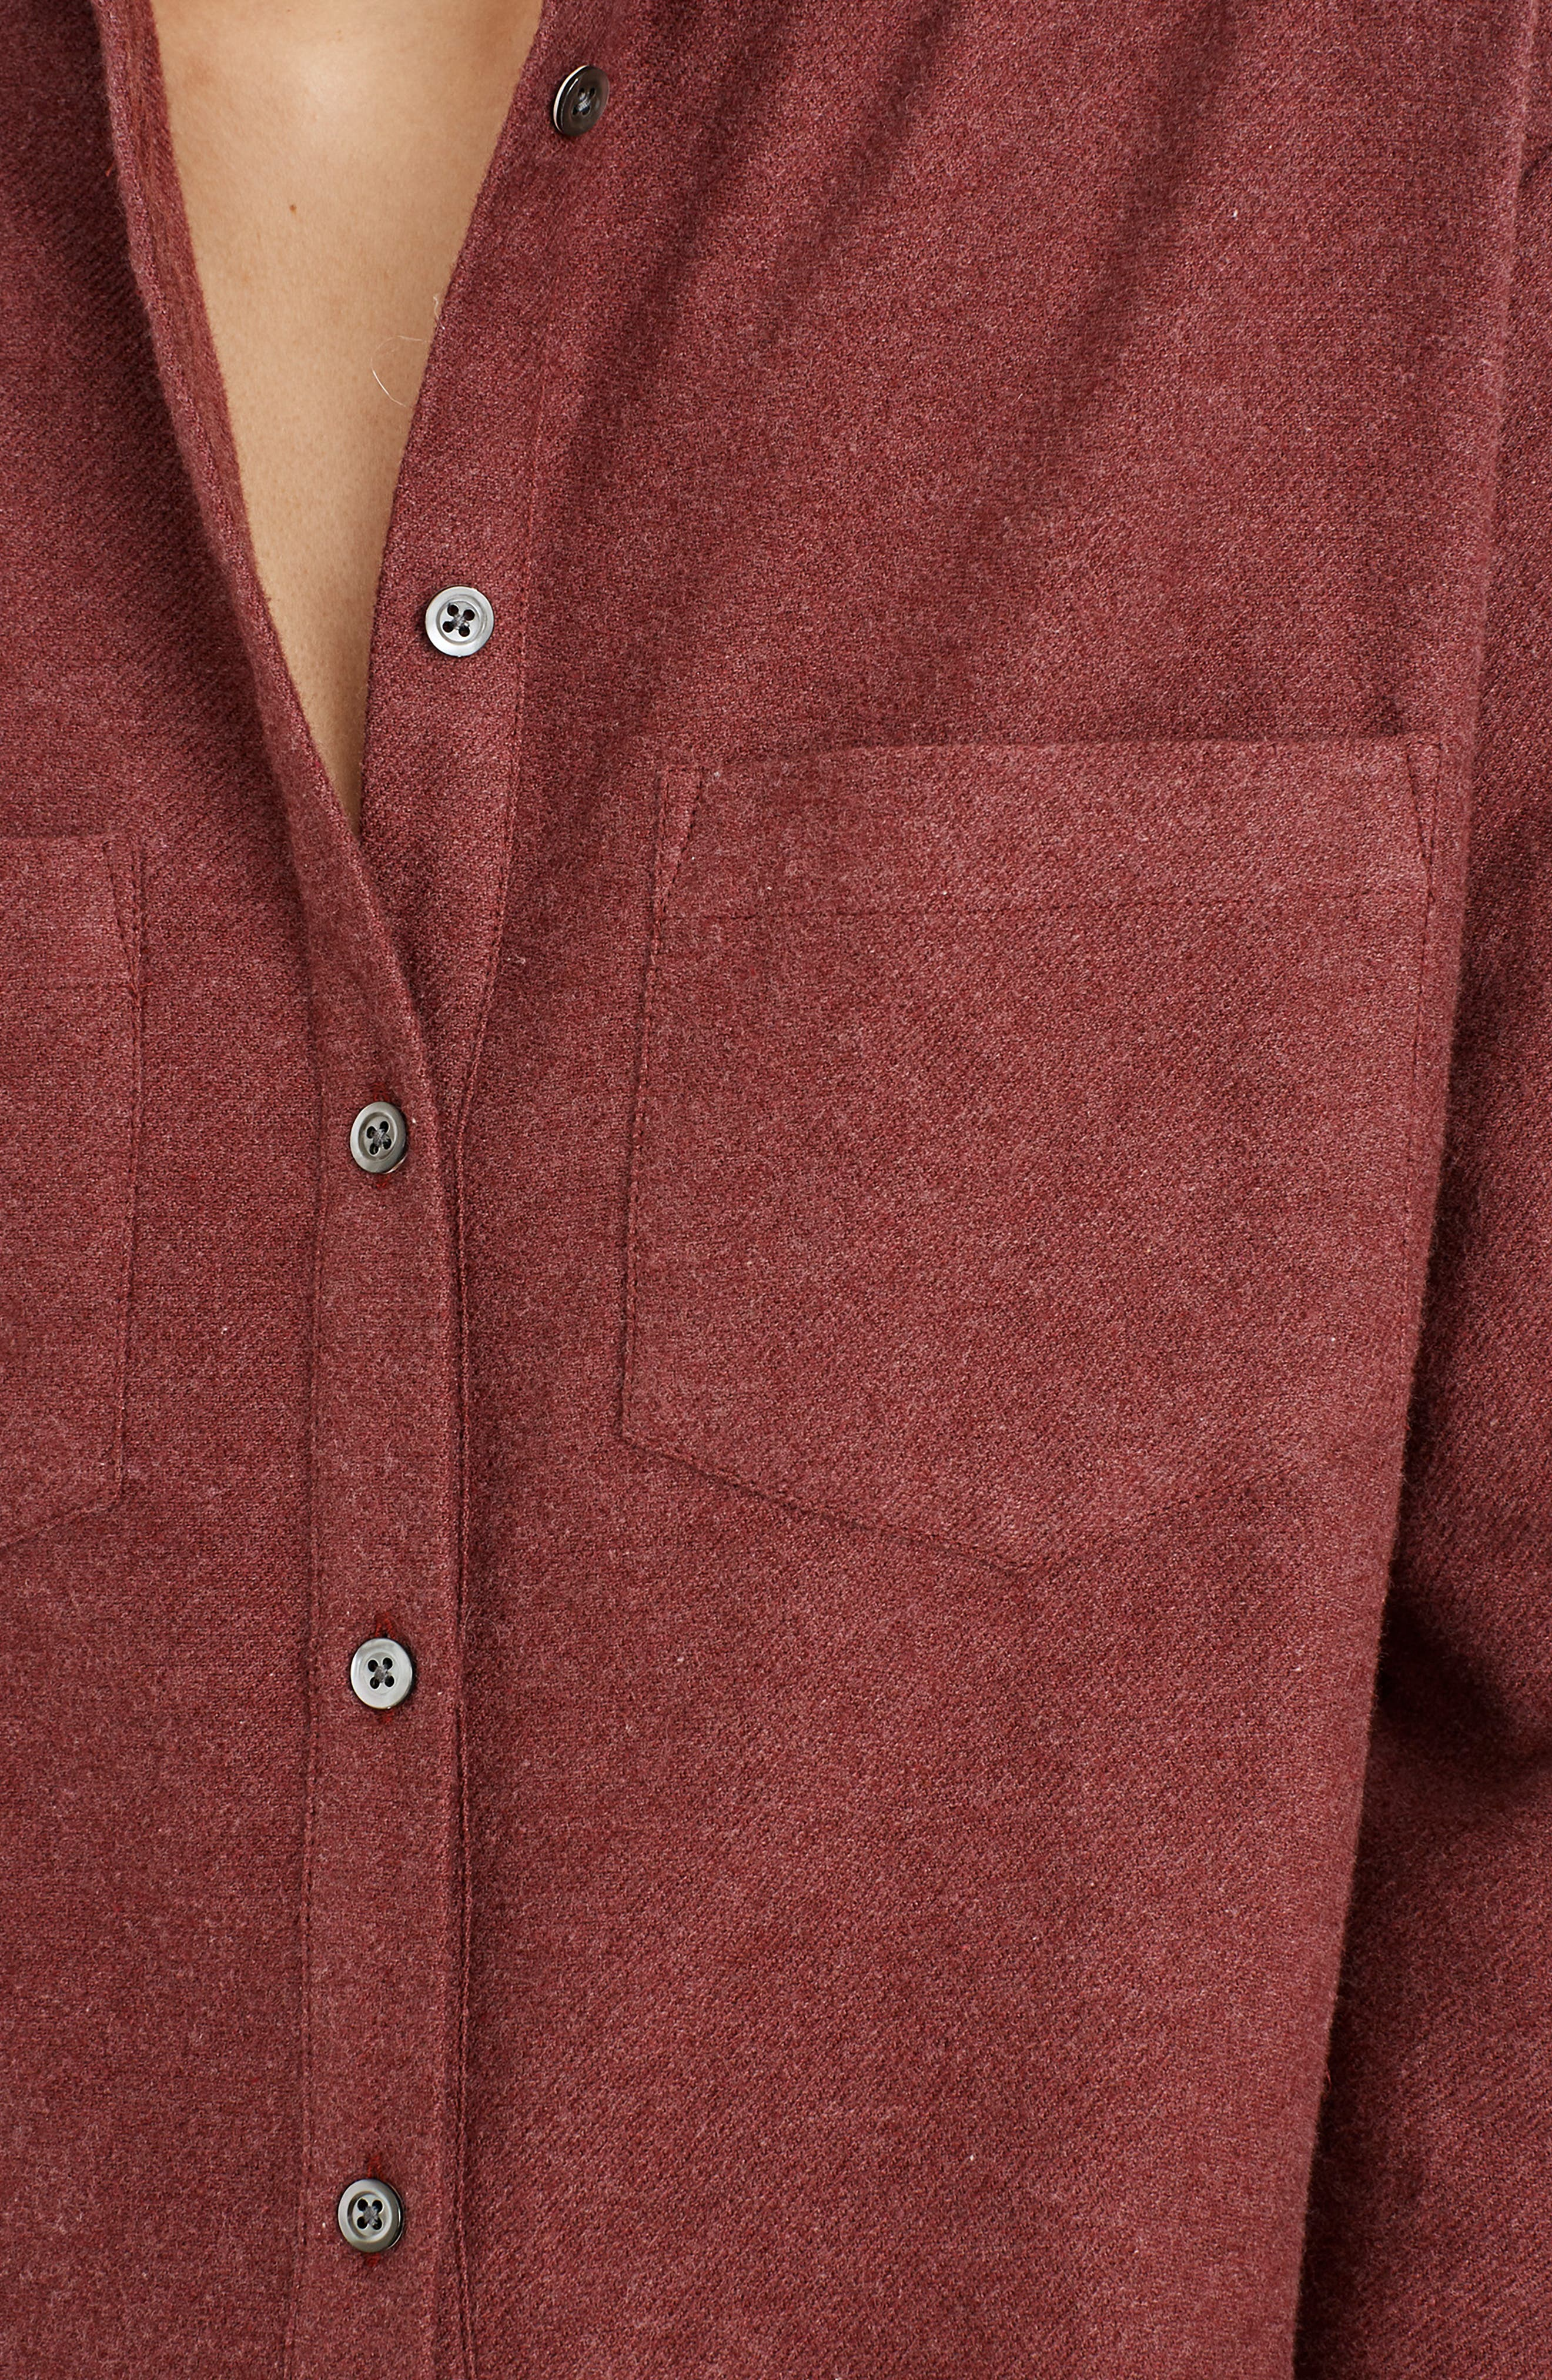 MADEWELL,                             Flannel Sunday Shirt,                             Alternate thumbnail 5, color,                             600